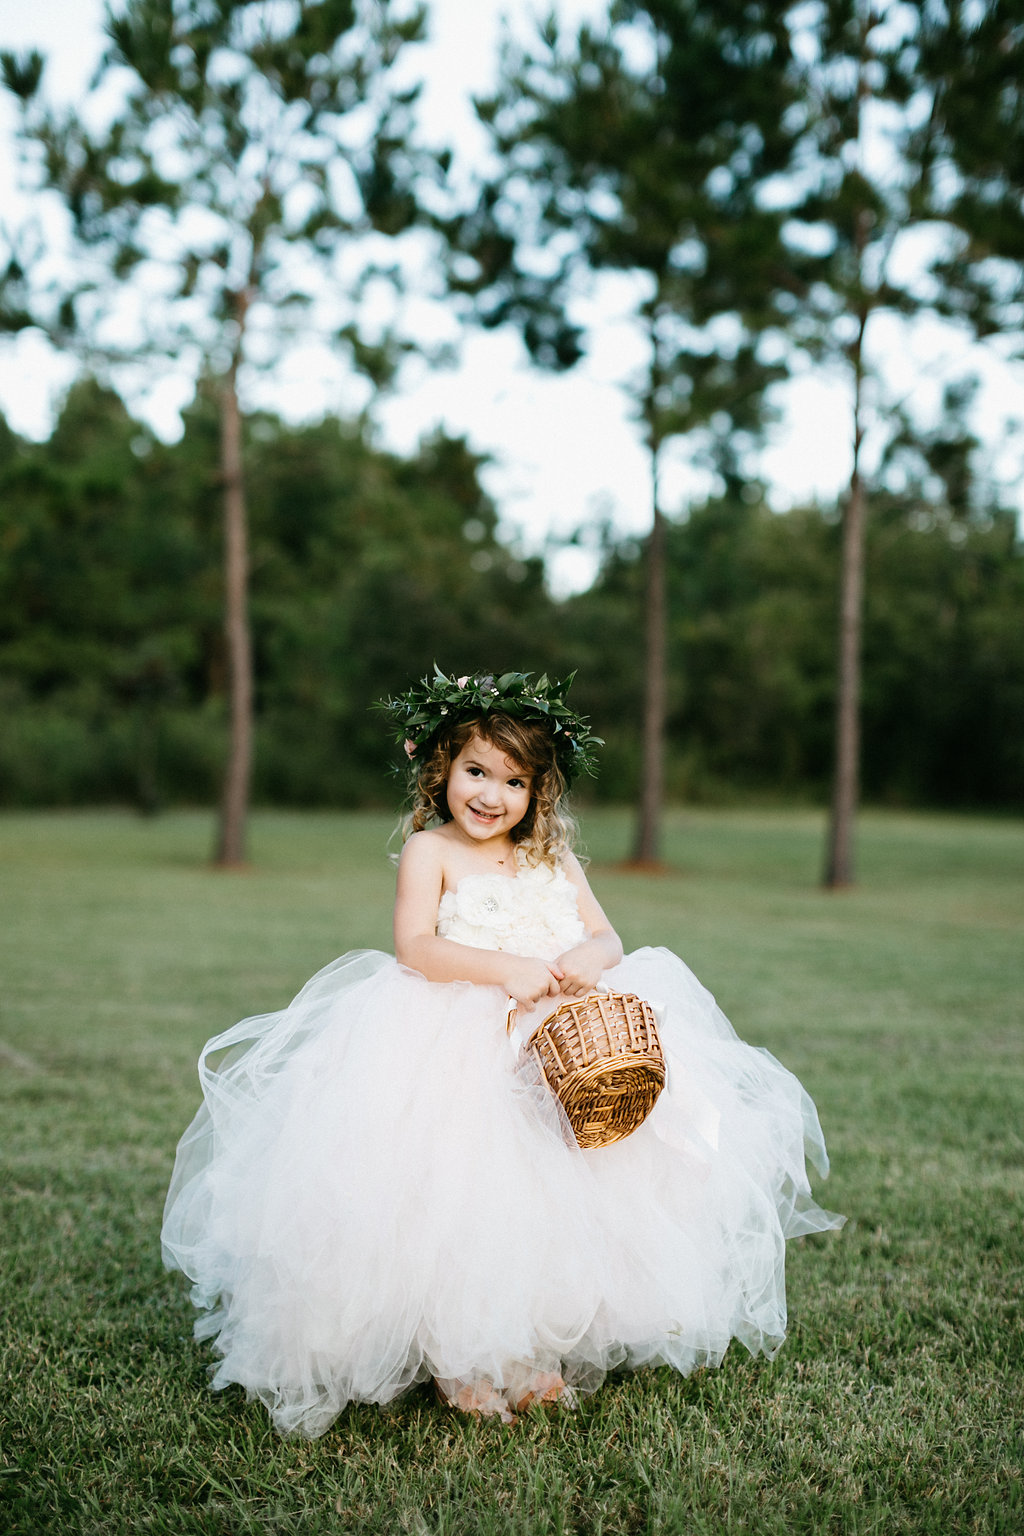 Charleston wedding at Wingate Plantation on Johns Island, SC l Flower girl l Monika Gauthier Photography